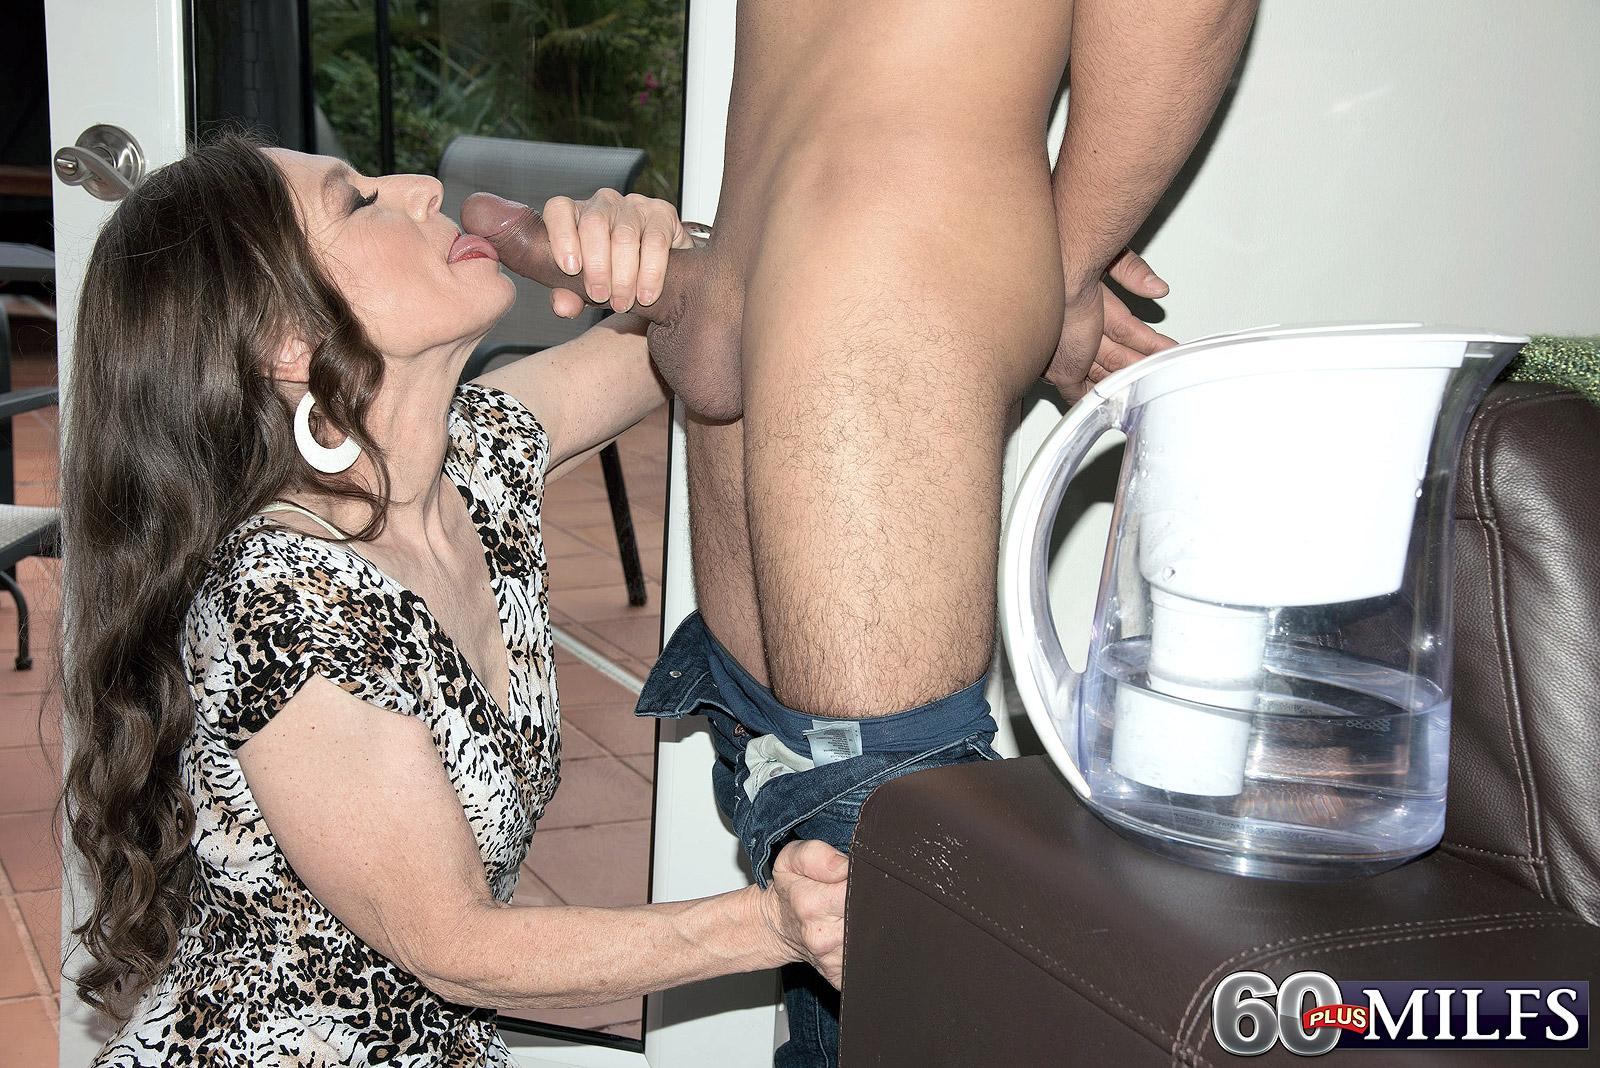 Dressed grandma Mona seducing junior guy by giving his huge cock fellatio